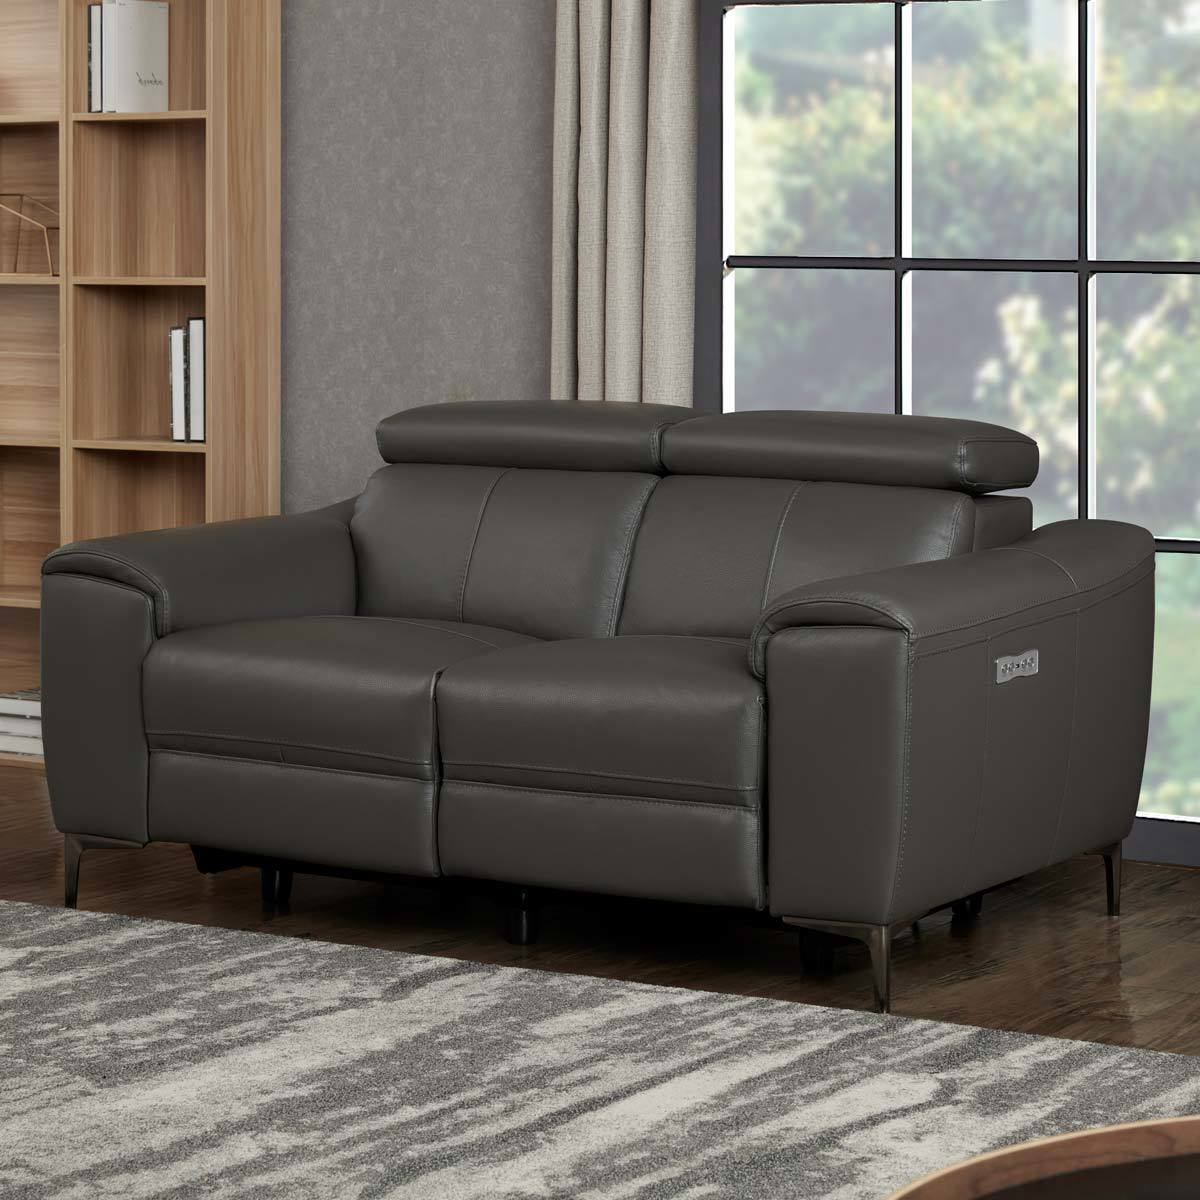 kuka warren 2 seater dark grey leather power reclining sofa costco uk